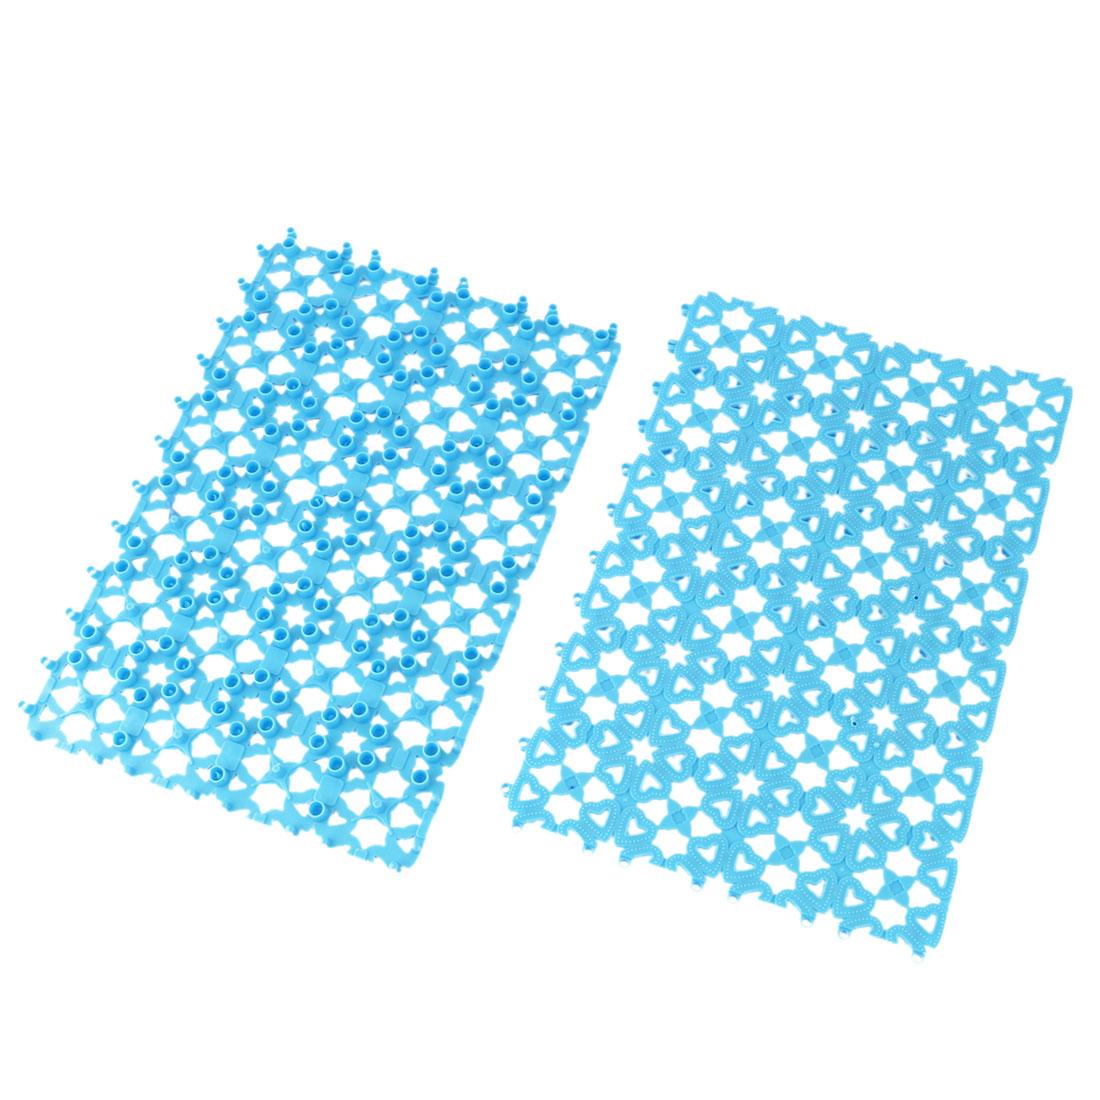 Bathroom Plastic Free Split Joint Water Resistant Anti-slip Shower Bath Mat Blue 2pcs